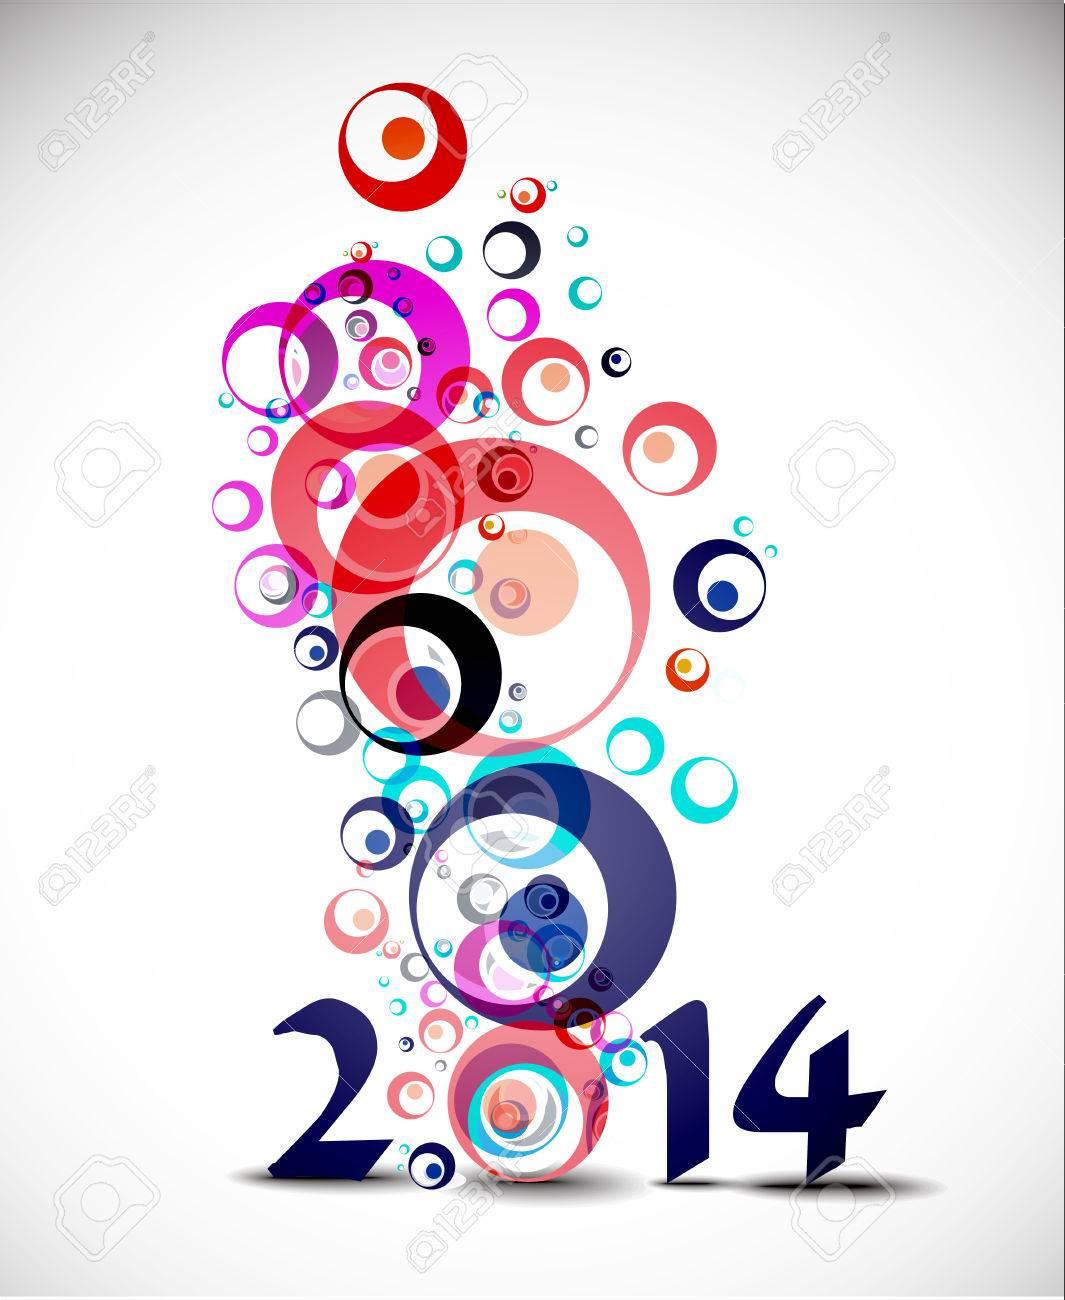 Happy New Year 2014 Circle Design Stock Vector - 24052114